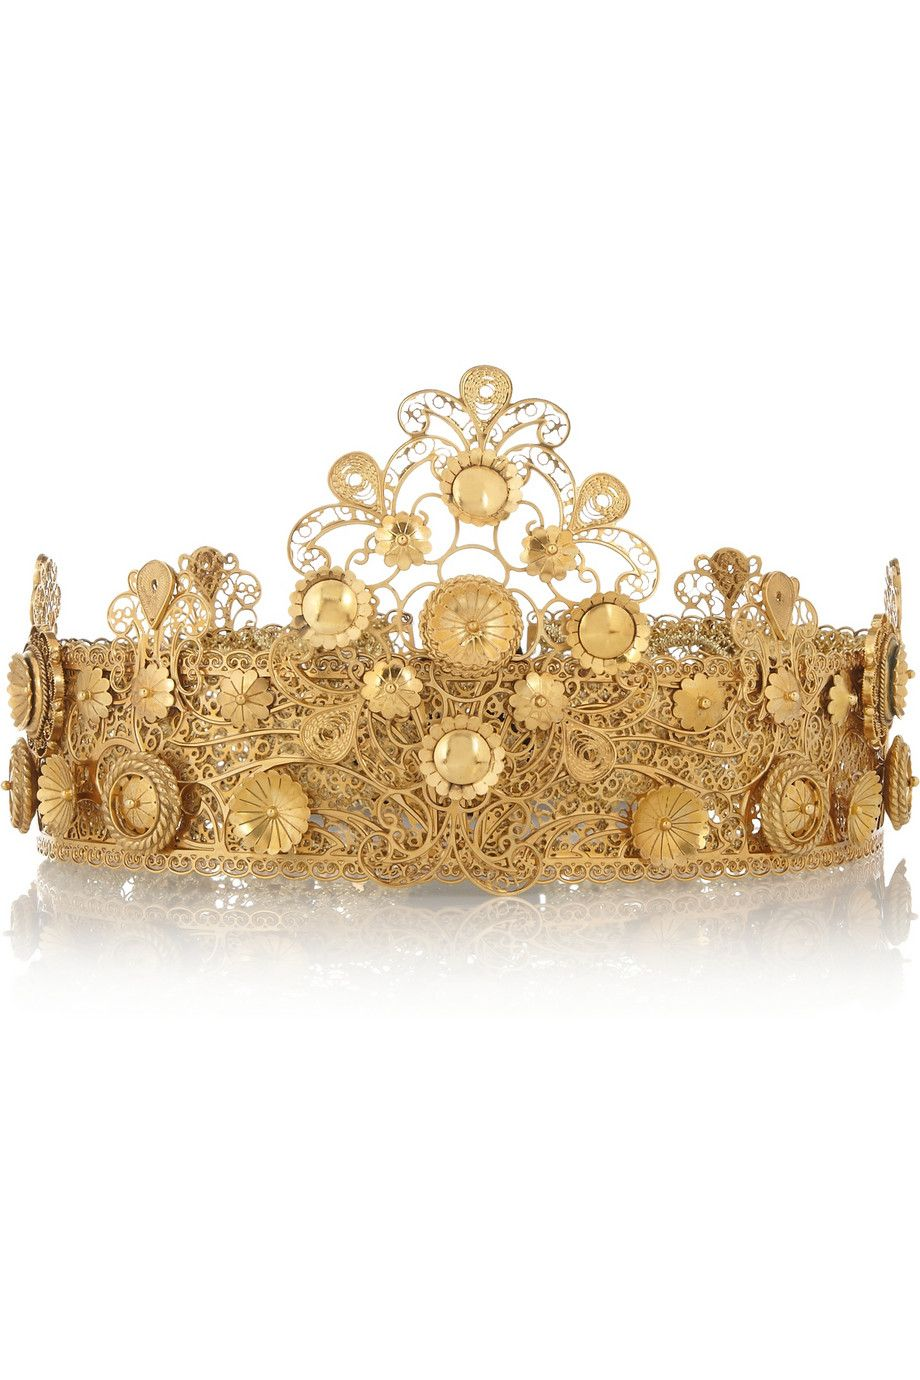 Dolce & Gabbana Gold-plated filigree crown